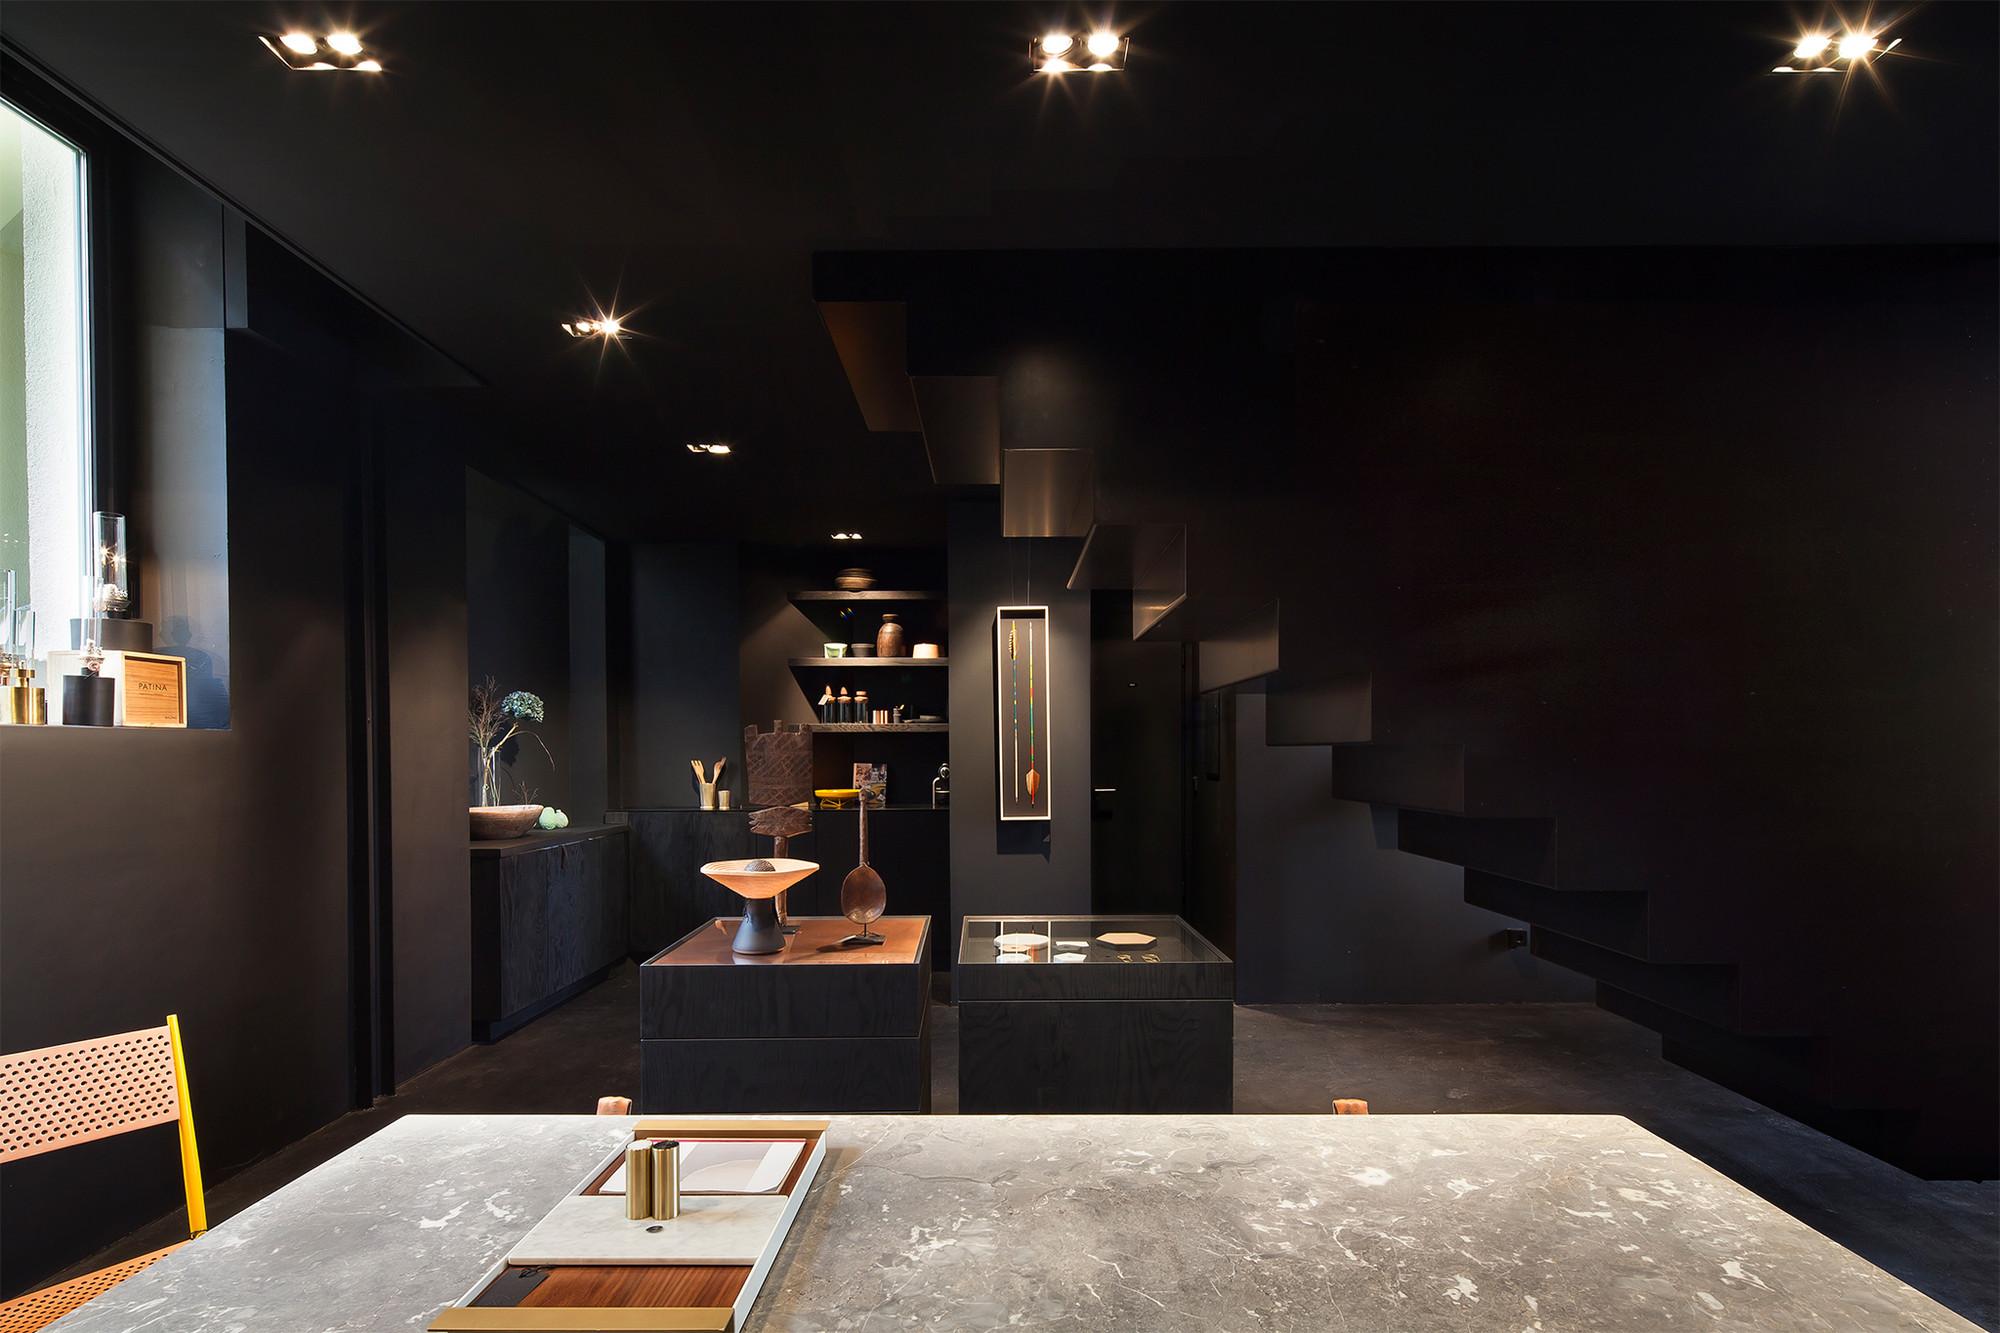 Gallery of bazar noir hidden fortress 9 for Idee de deco couloir